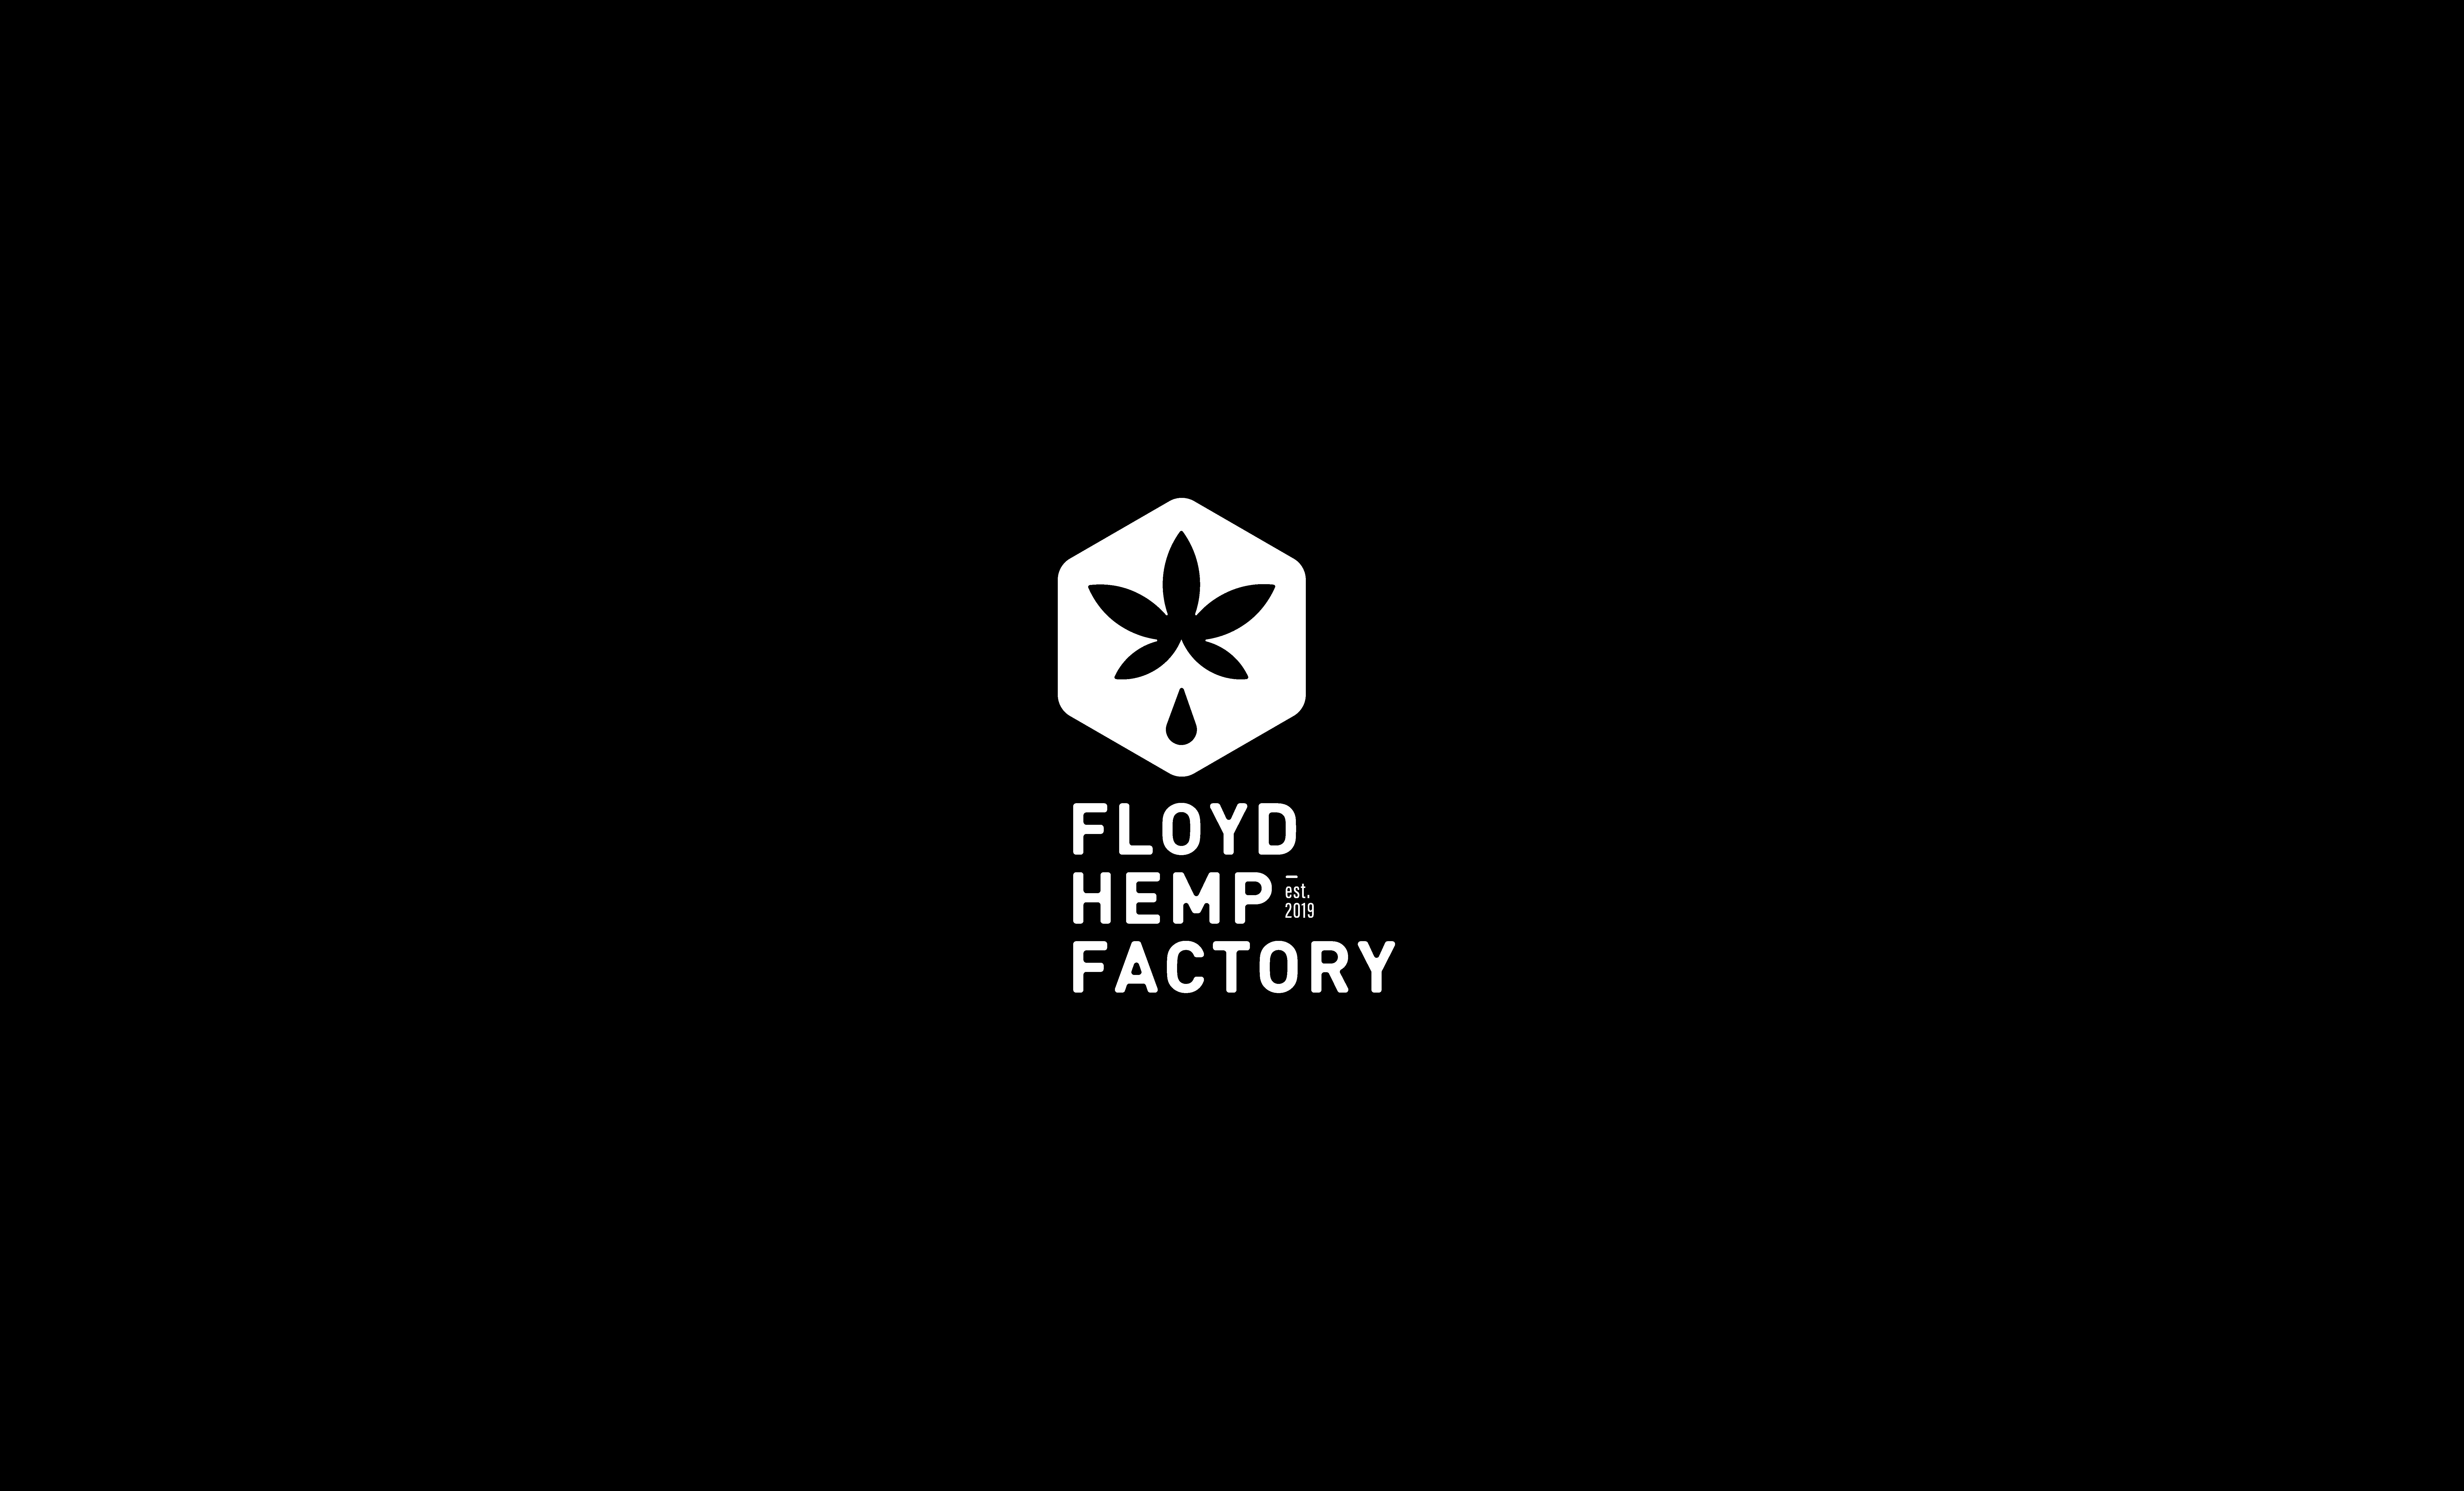 Floyd Hemp Factory